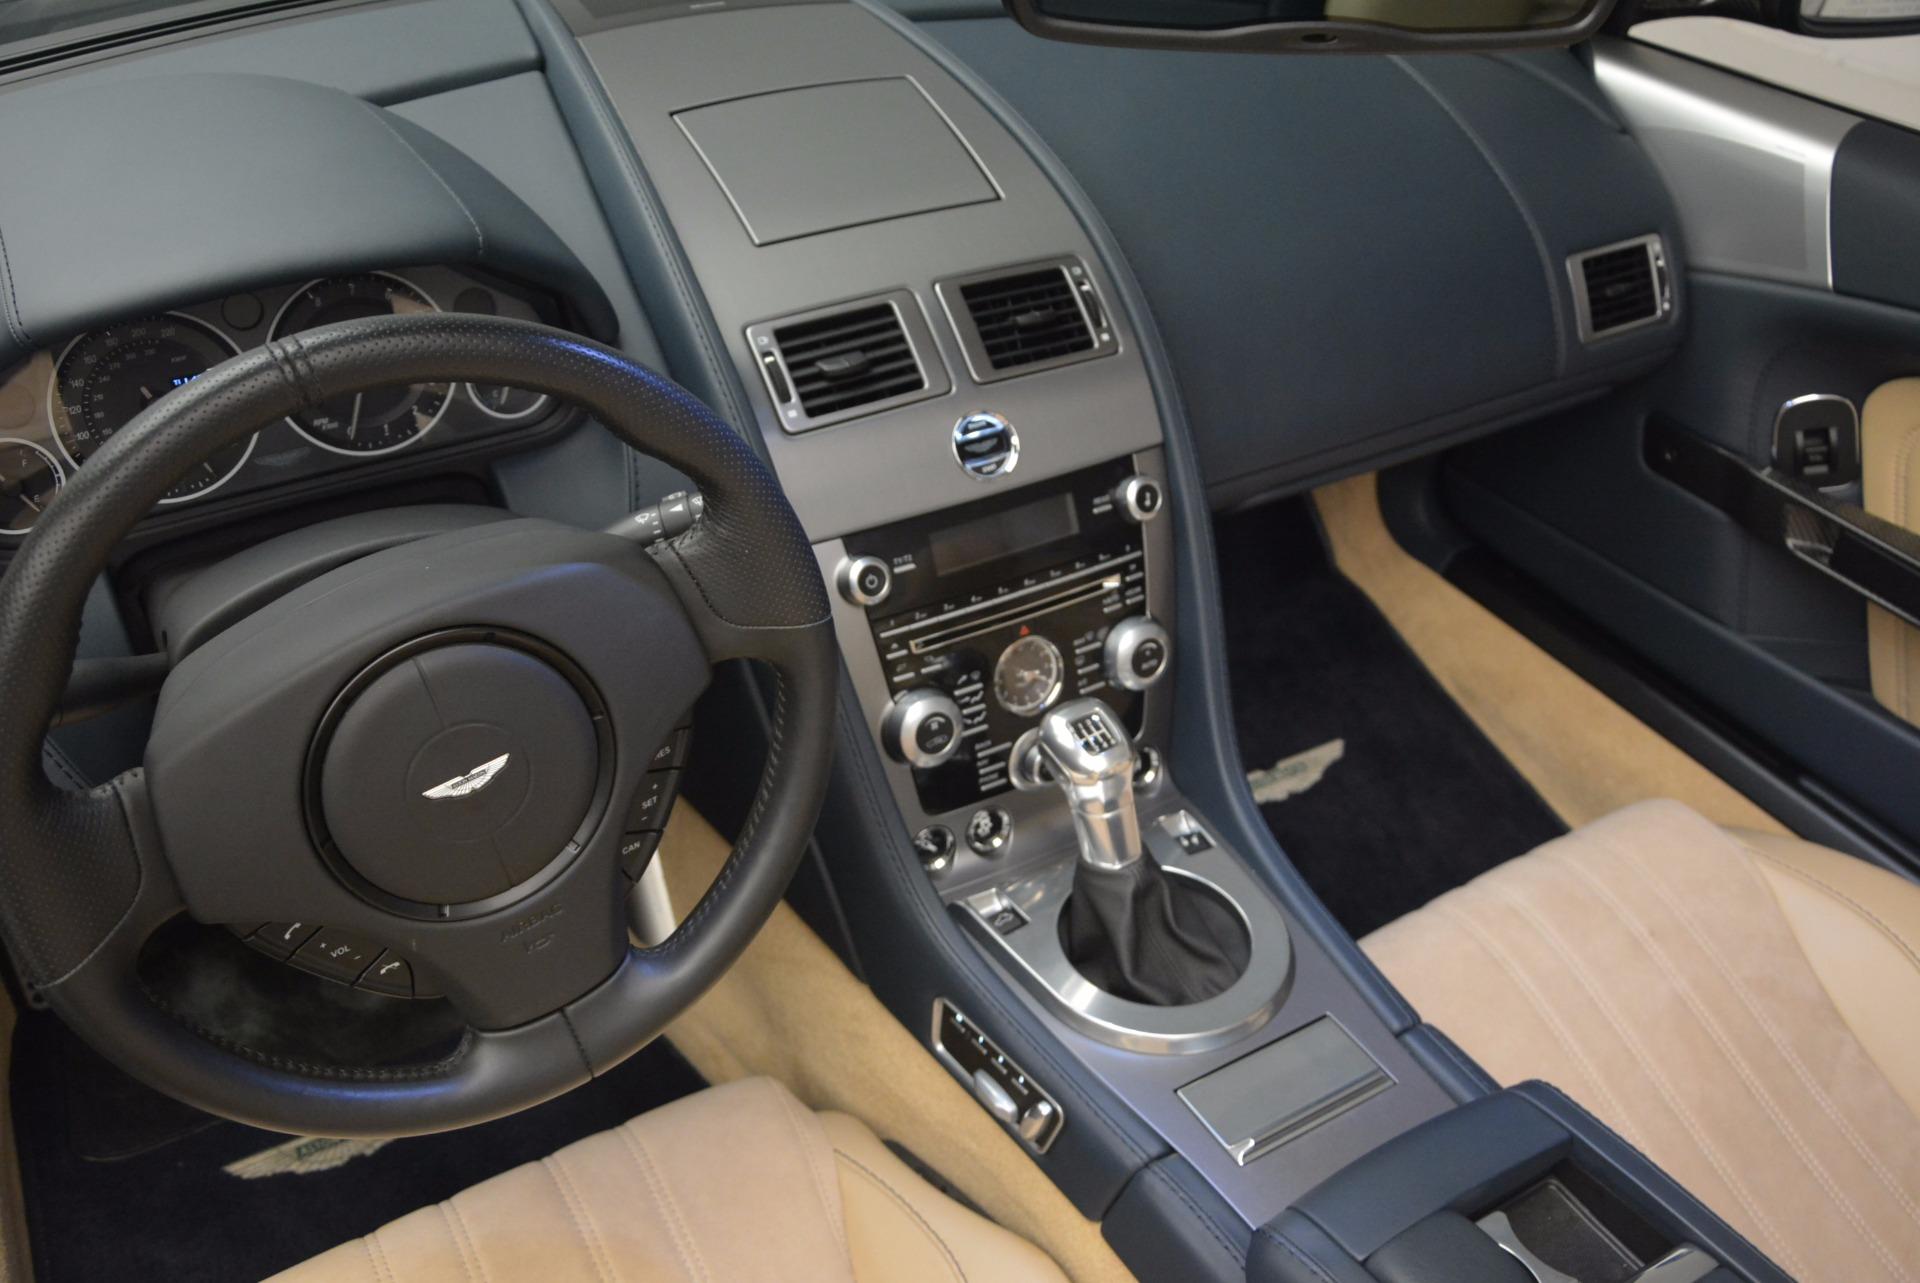 Used 2012 Aston Martin DBS Volante For Sale In Greenwich, CT 644_p27